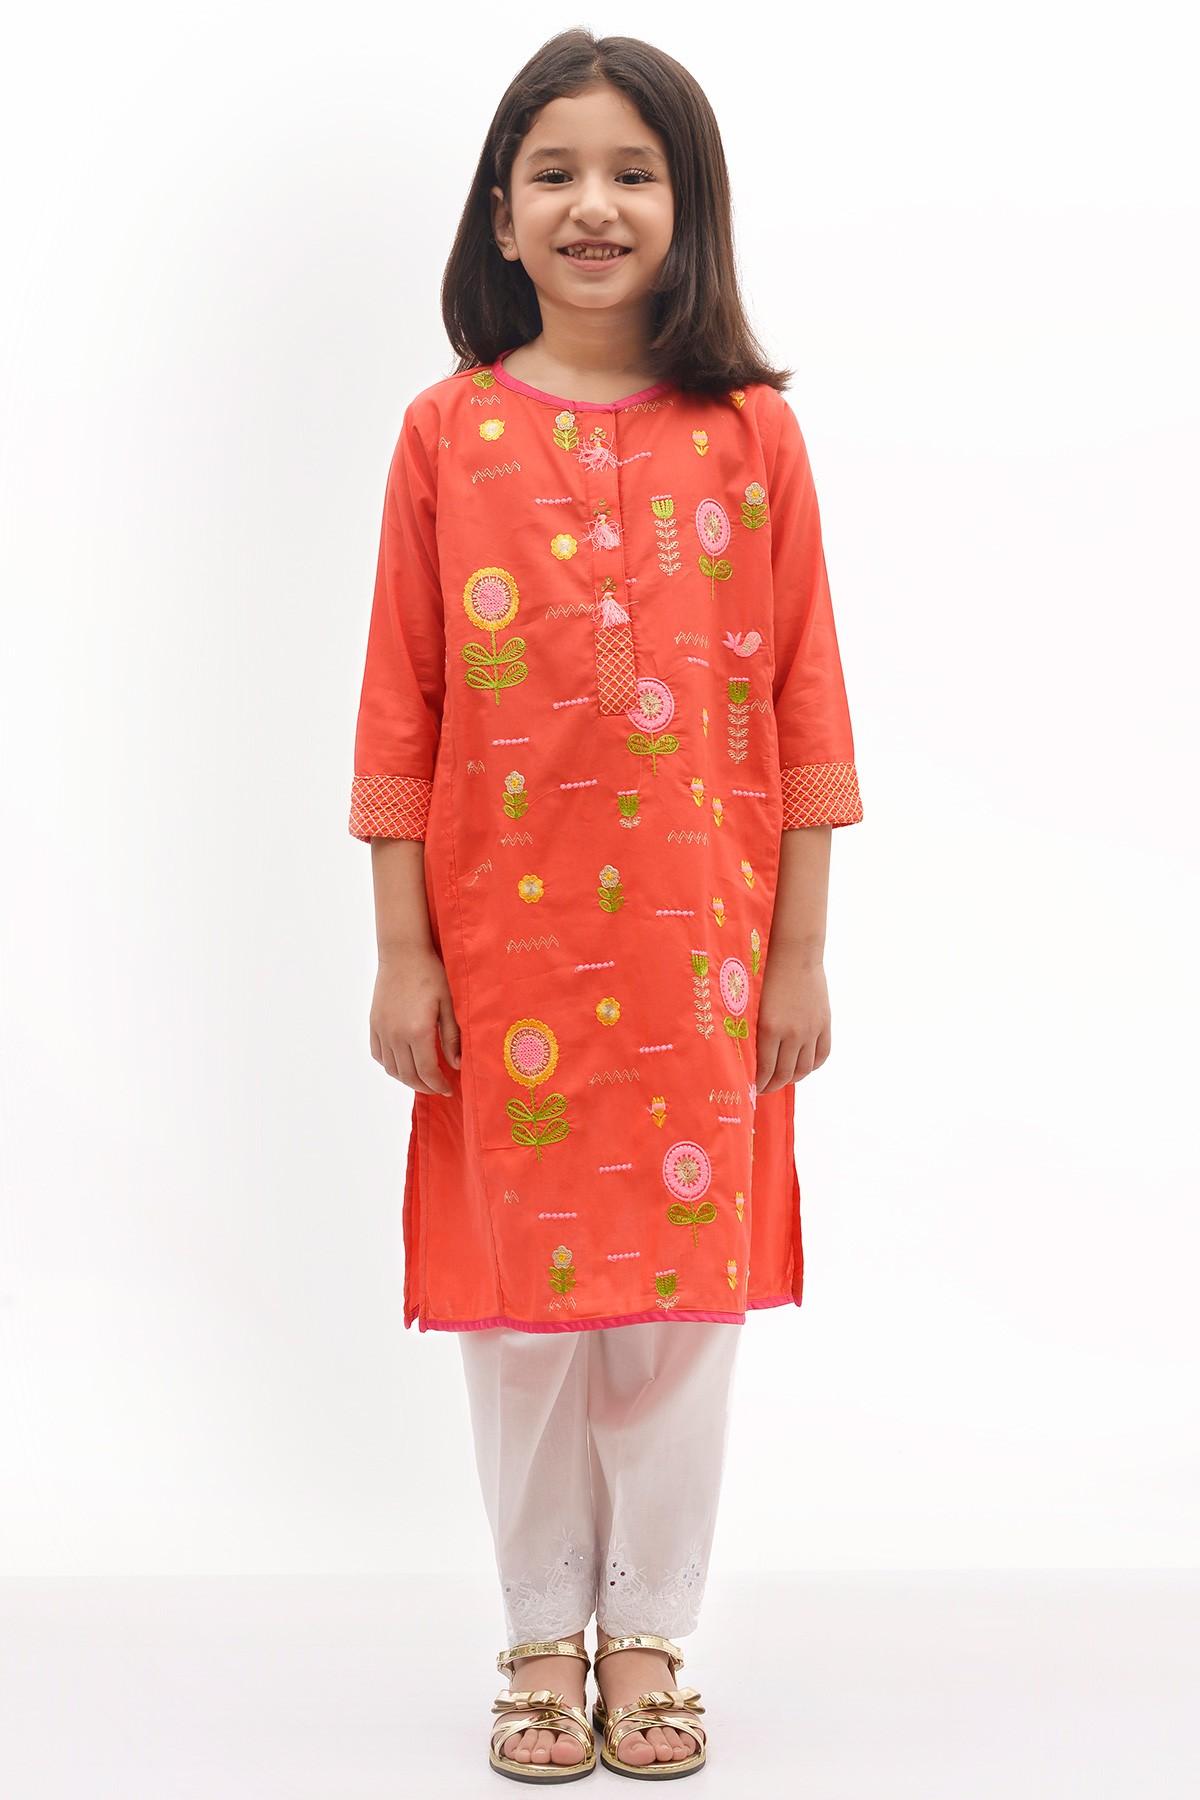 Home Textile Design Studio India Khaadi Baby Girls Dresses For Summer 2017 Pk Vogue